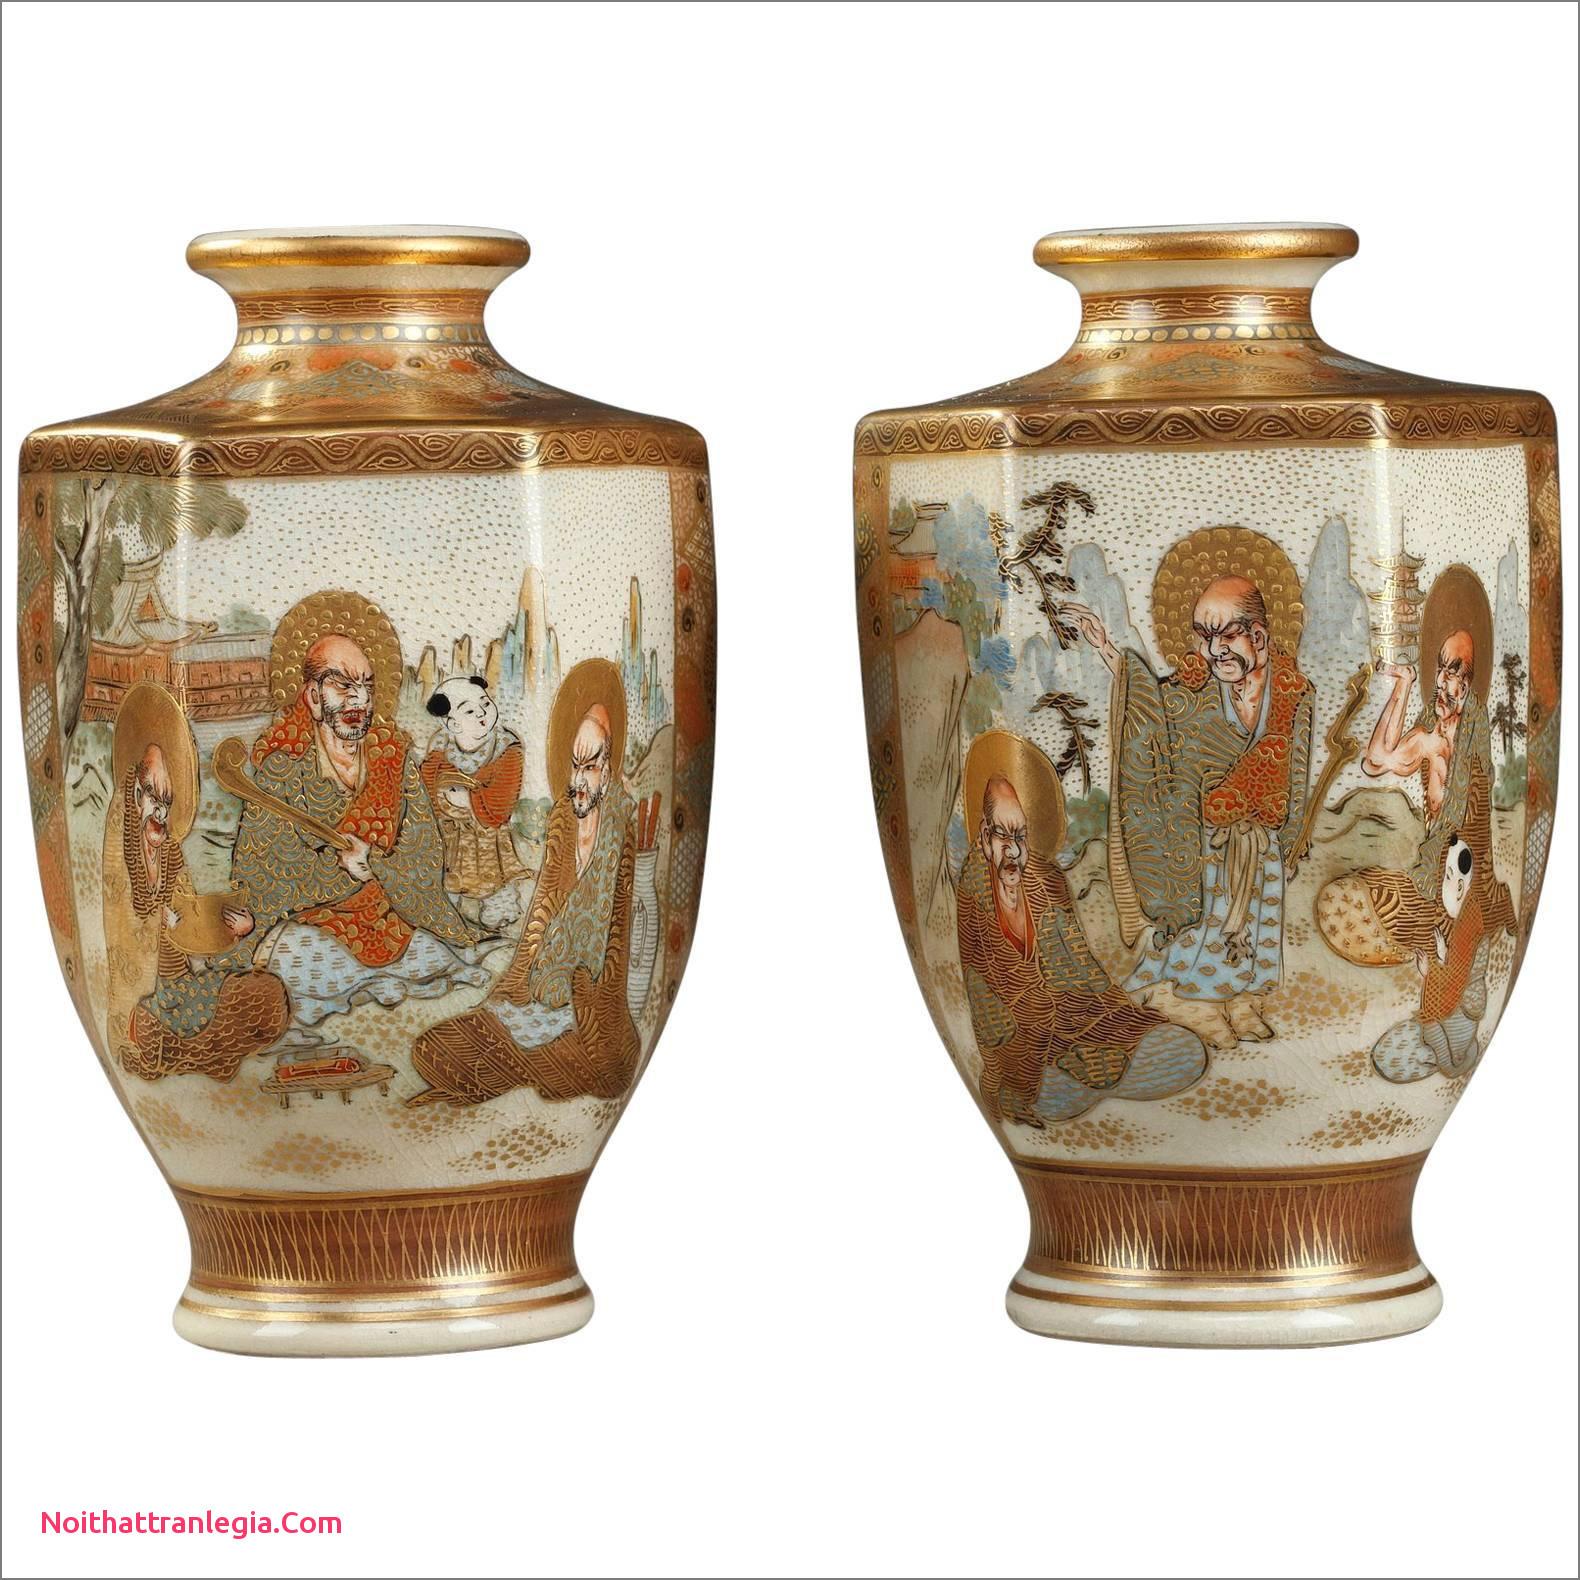 vintage usa pottery vases of 20 chinese antique vase noithattranlegia vases design for chinese ginger jar table lamps elegant pair 20th century general porcelain trenton nj usa industrial